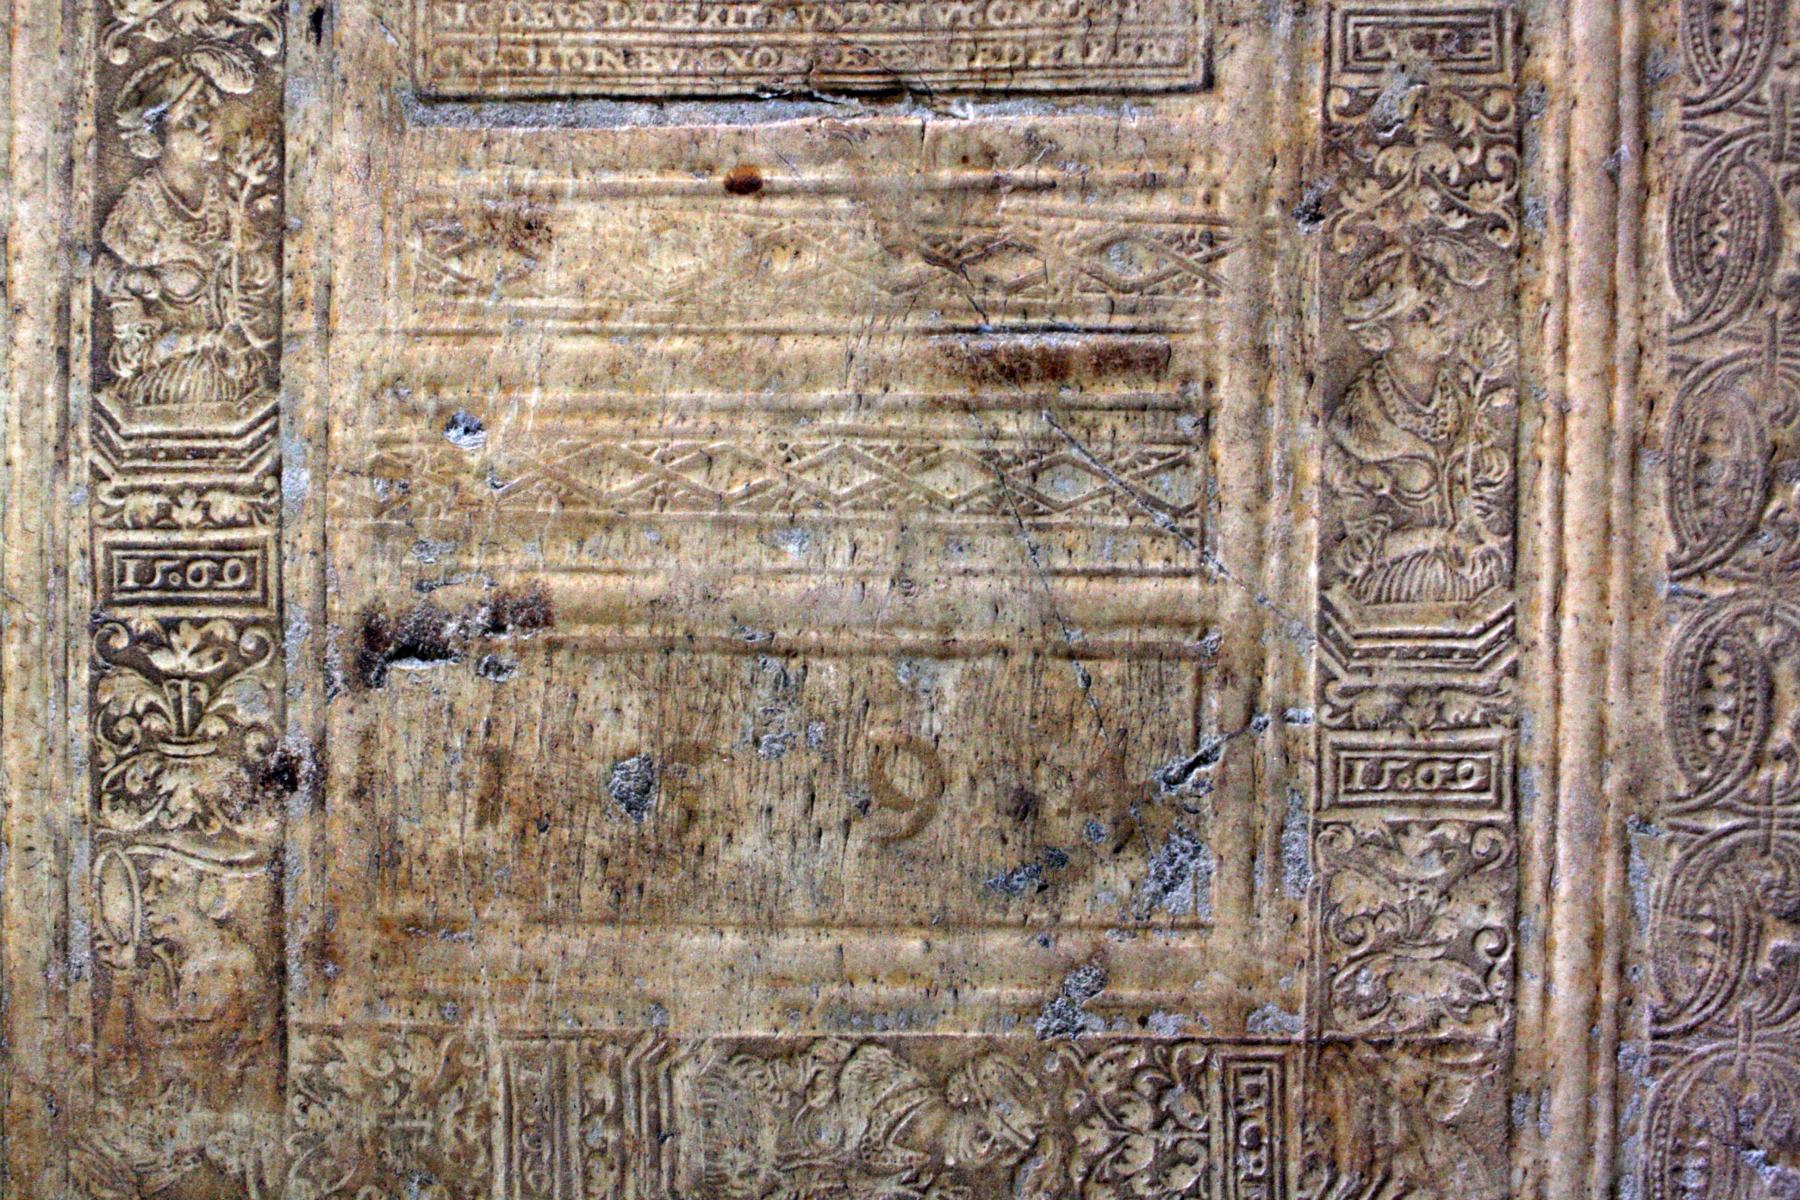 Griechische-Lateinische Bibel, Novum Testamentum 1582-5